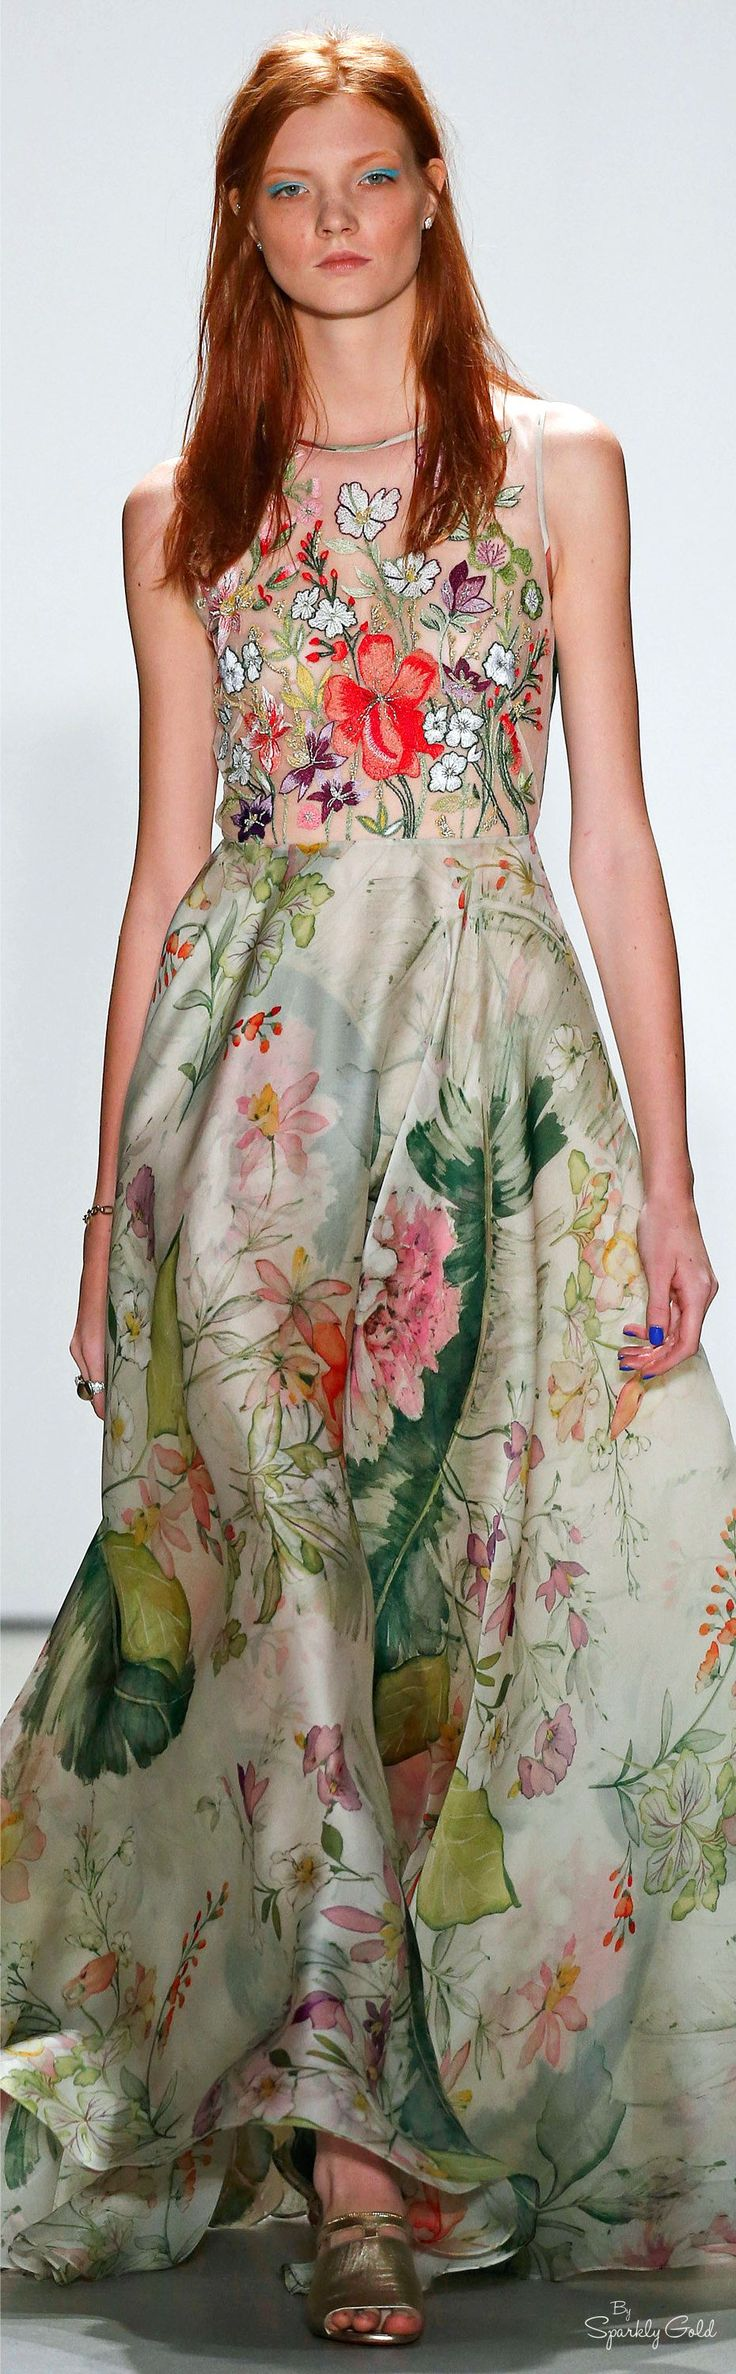 best ΑΠΟΓΕΥΜΑΤΙΝΟ images on pinterest feminine fashion for